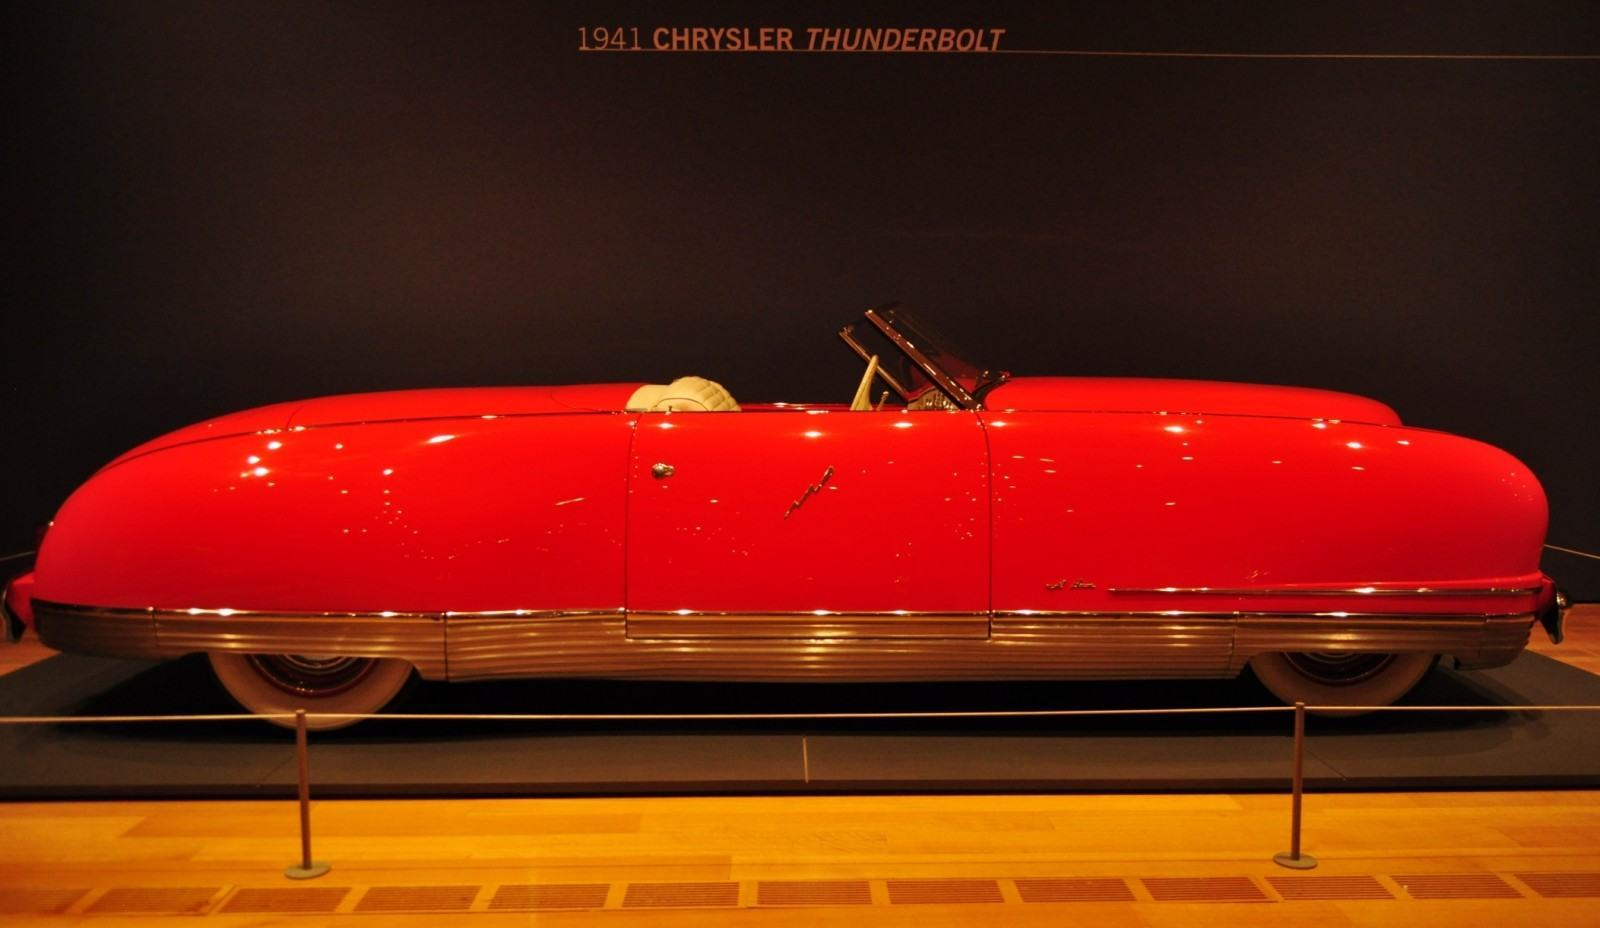 Atlanta Dream Cars Showcase - 1941 Chrysler Thunderbolt Is Aero Convertible Coupe 19